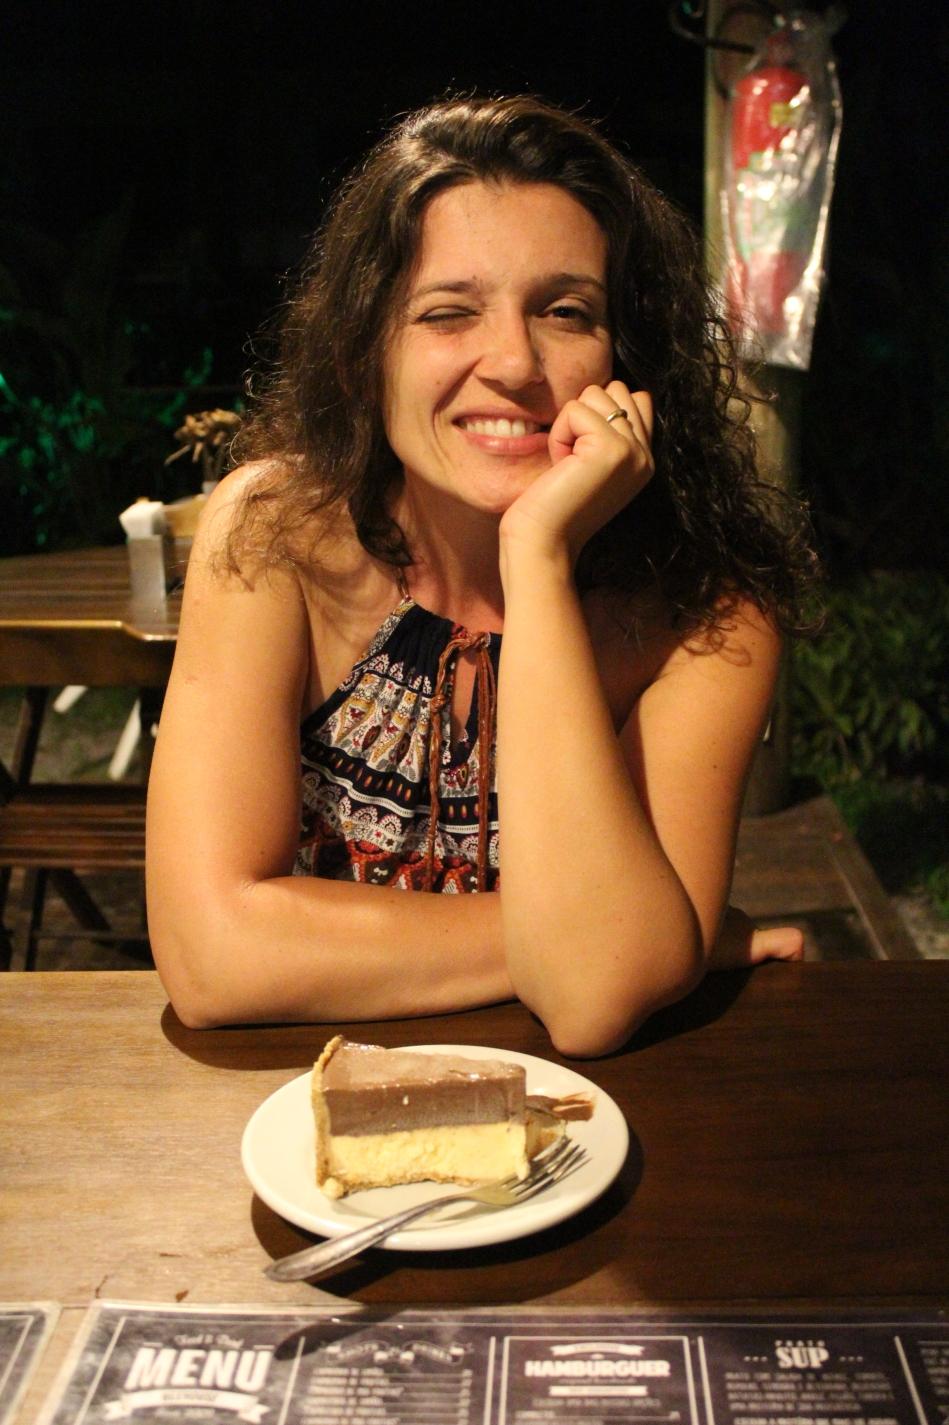 Maracolate_Behouse_ilha_do_mel